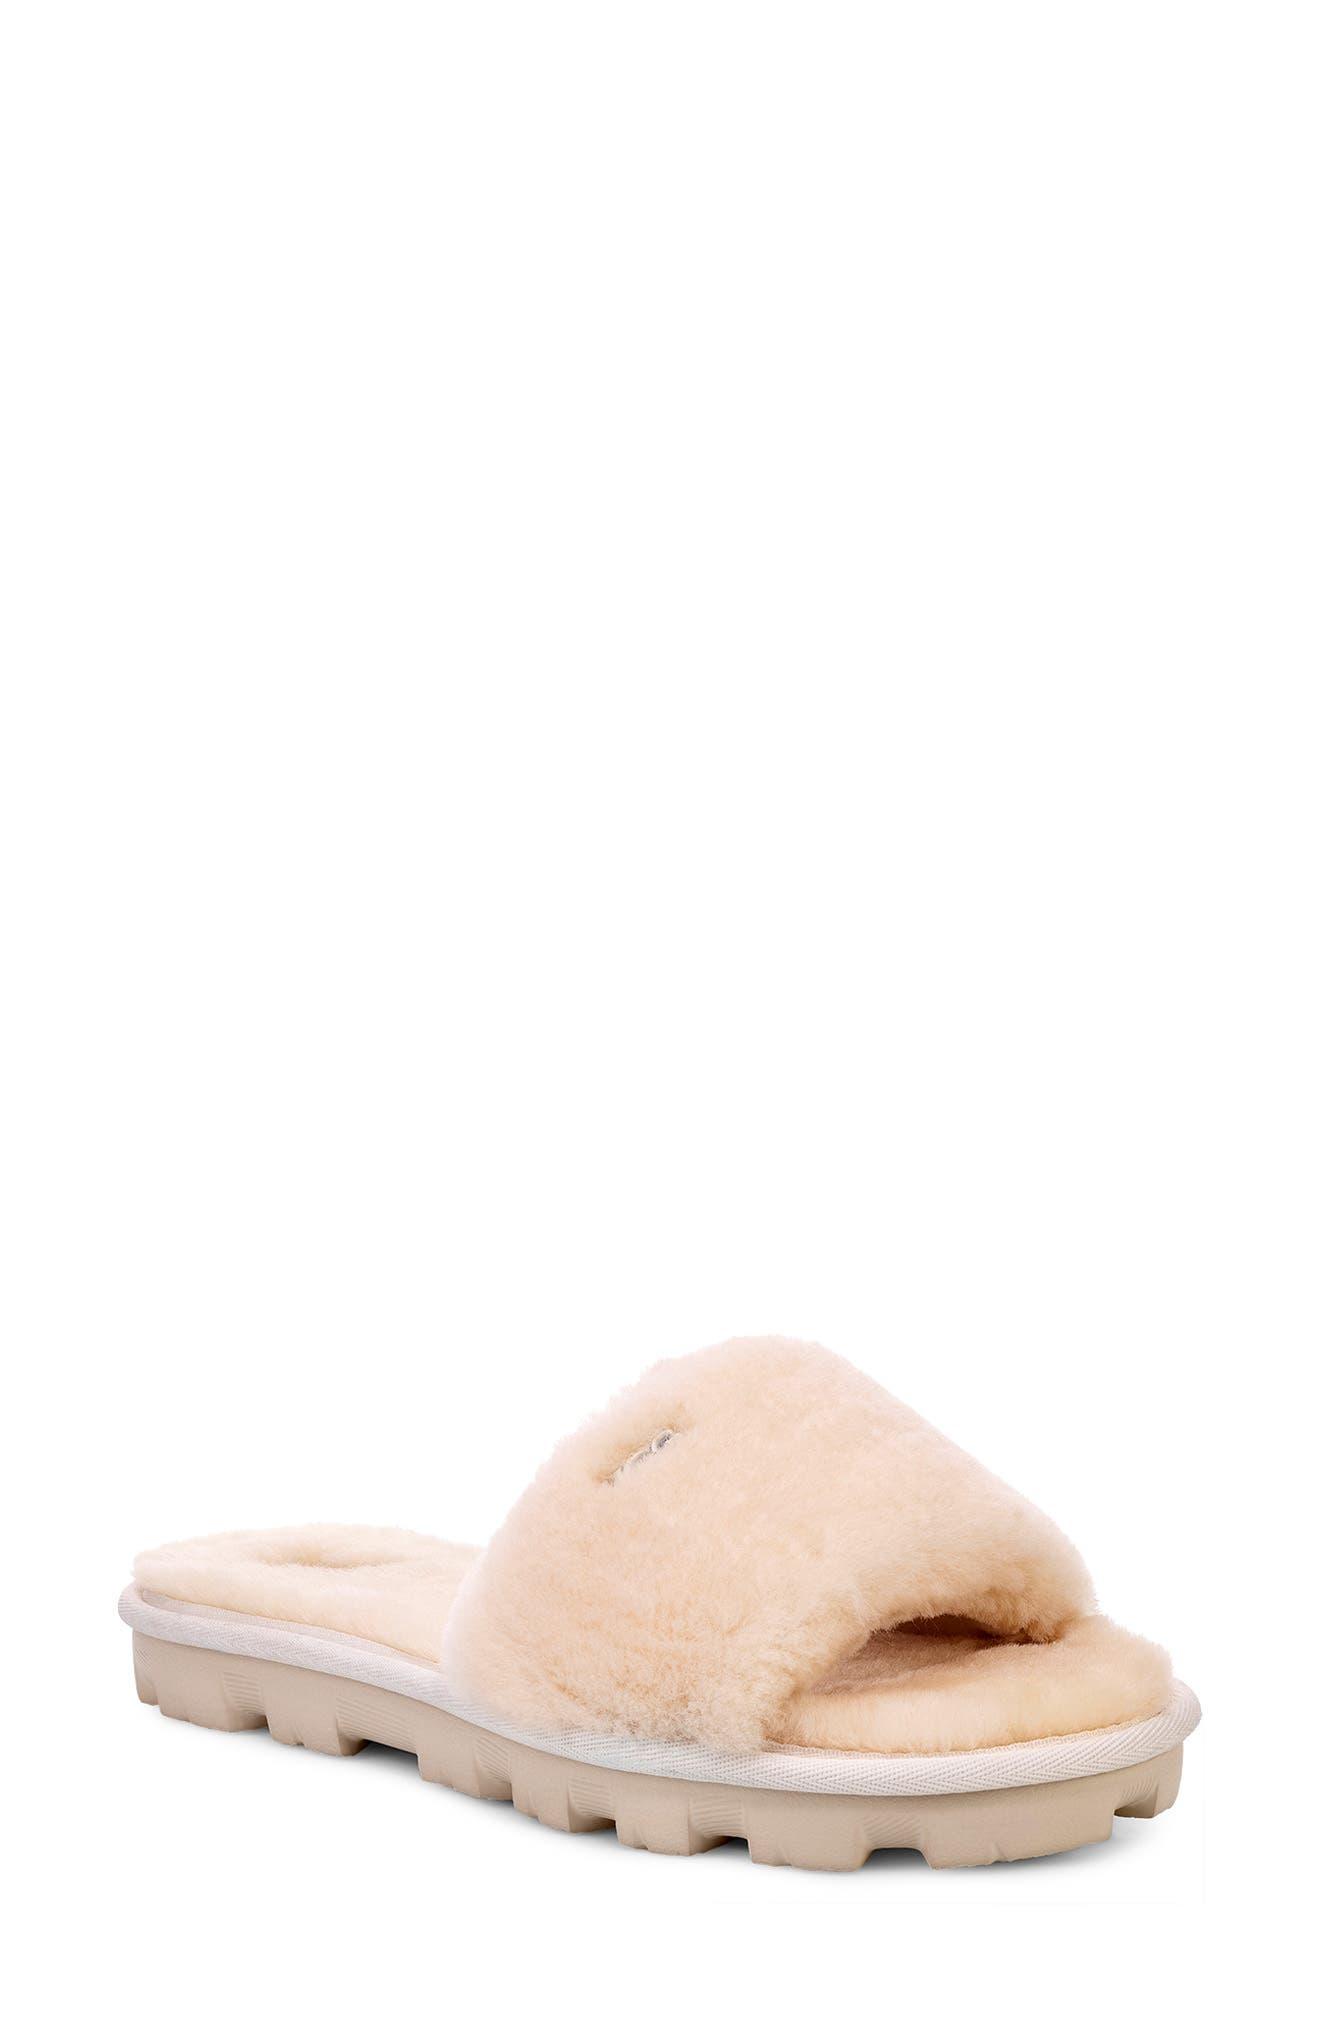 Ugg Cosette Genuine Shearling Slipper, Beige